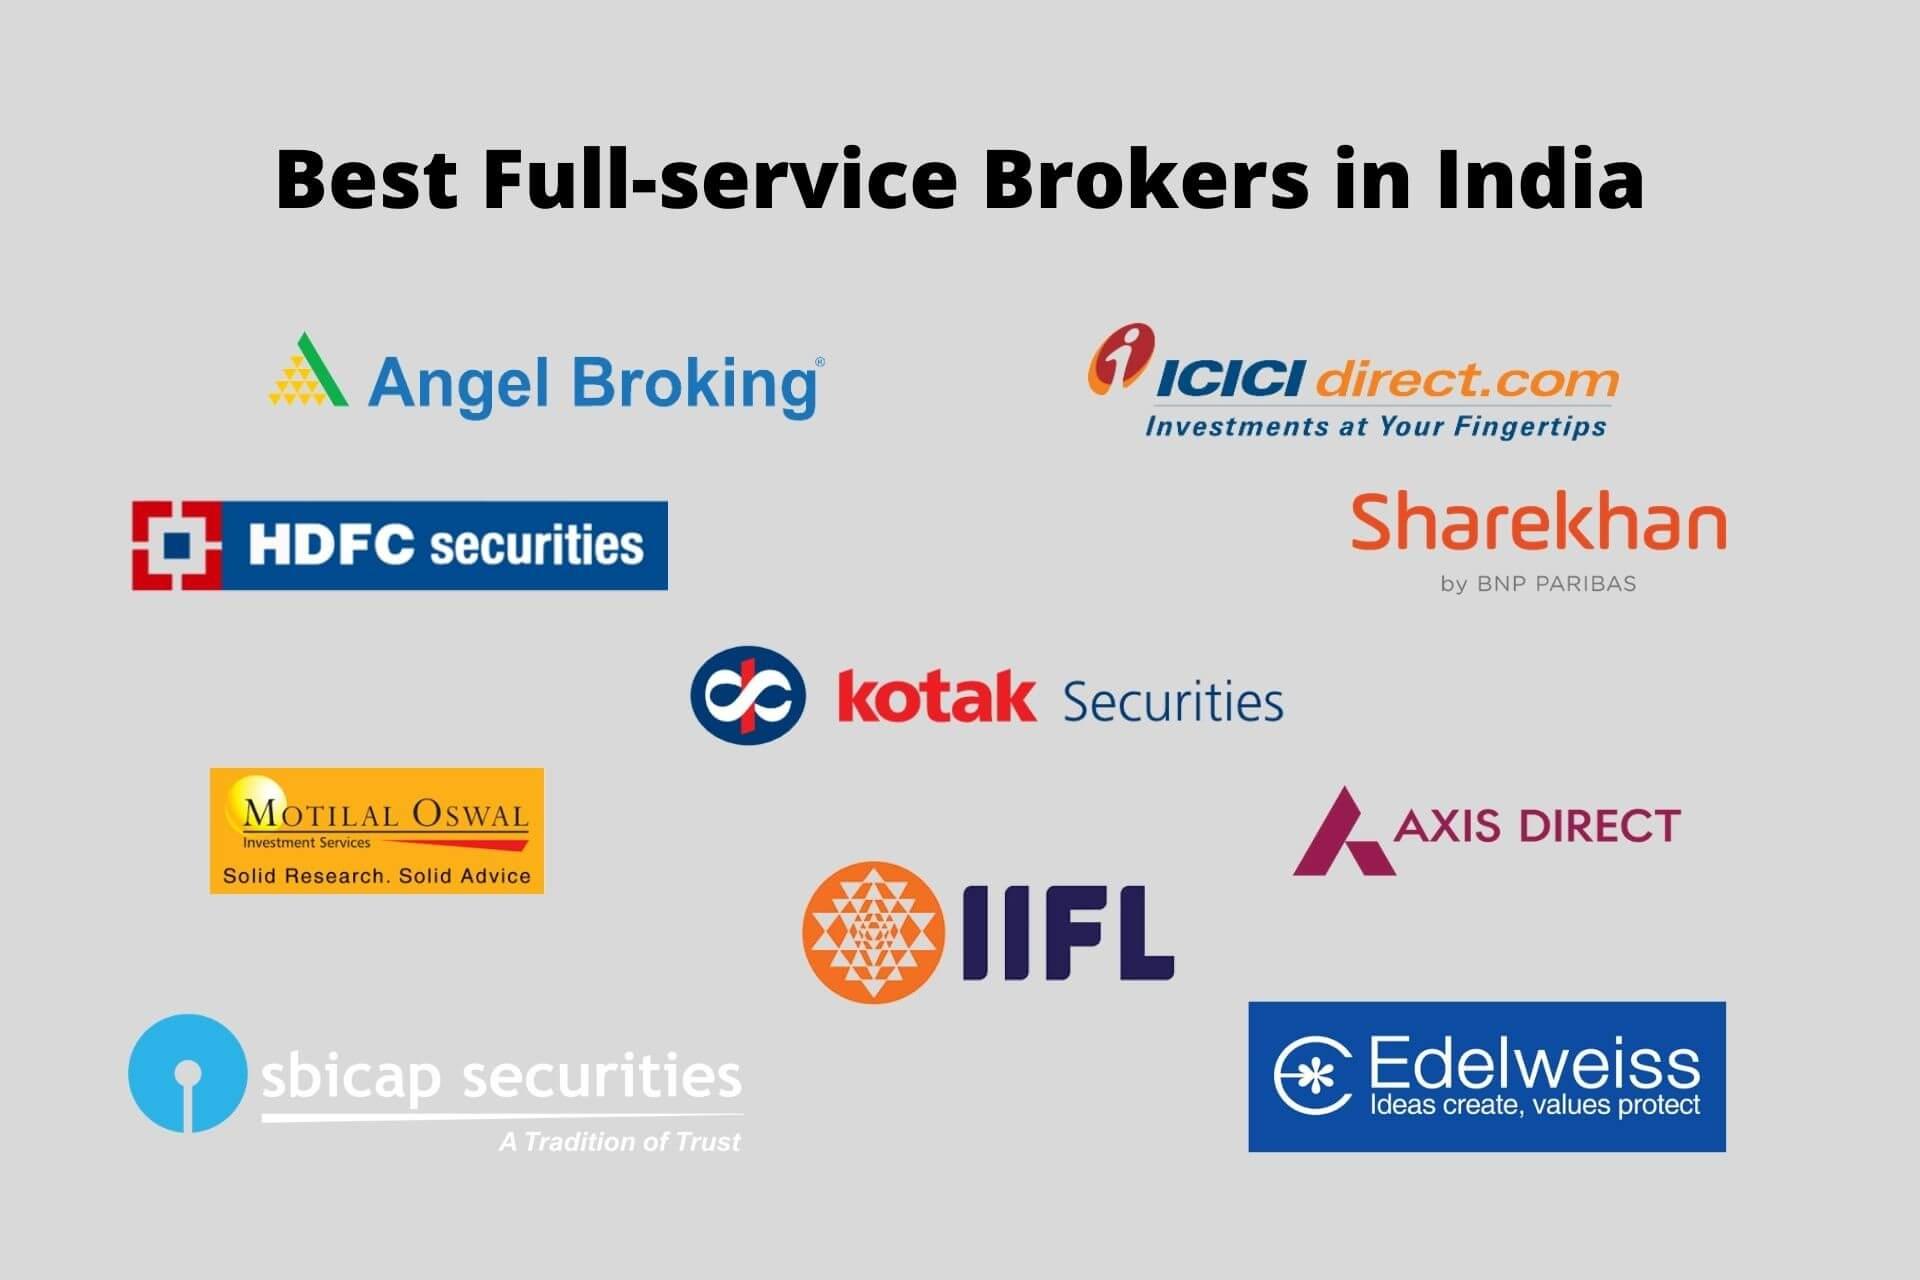 Top 10 Best Full-Service Brokers in India 2021!